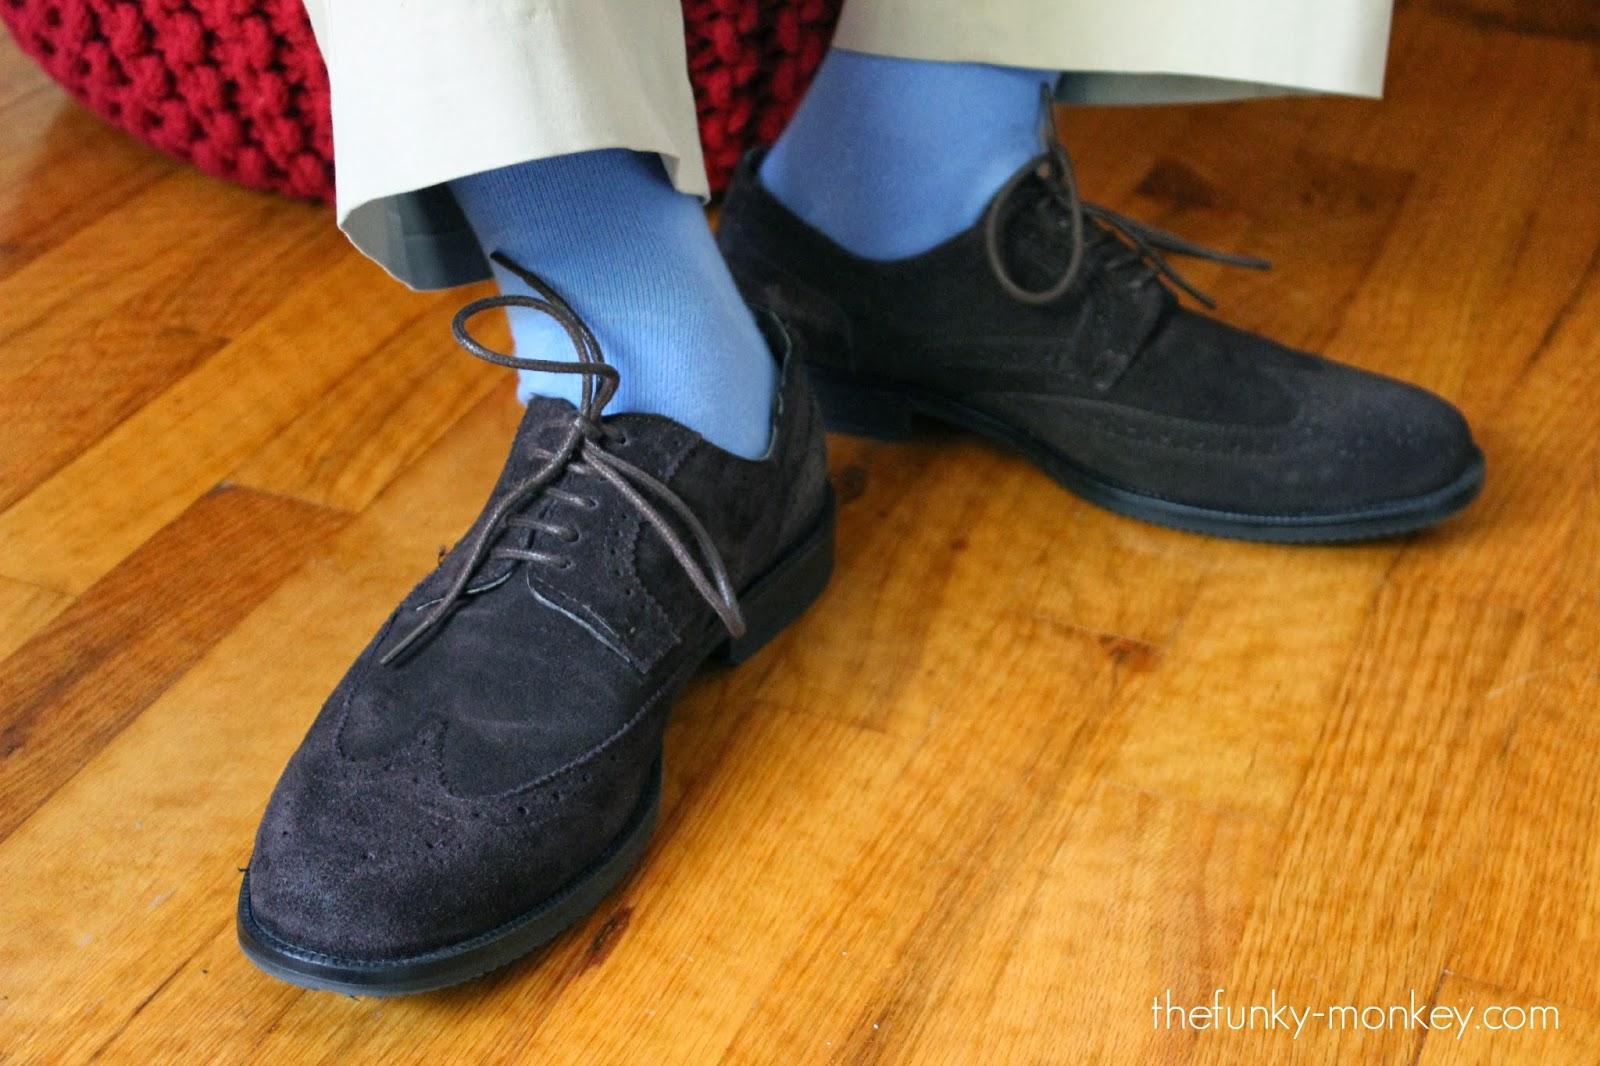 Baby blue dress socks